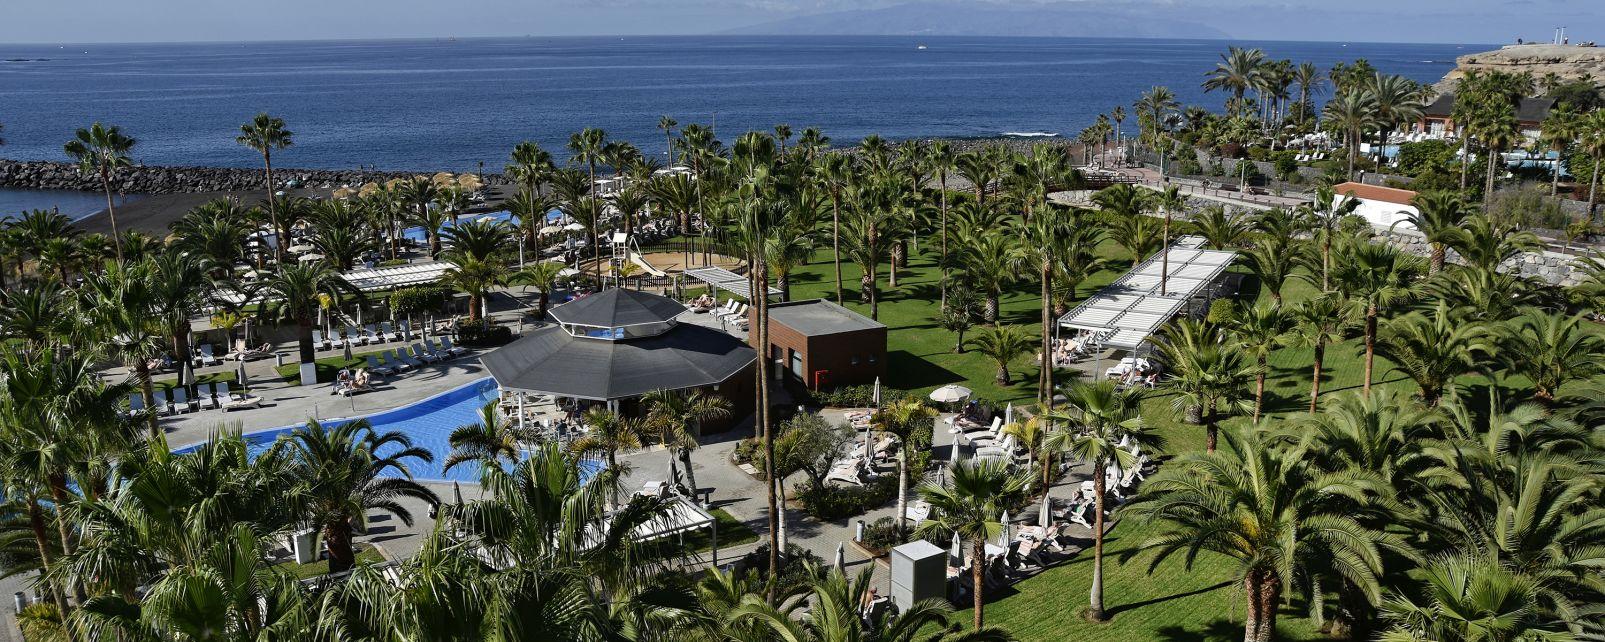 Hôtel Riu Palace Tenerife